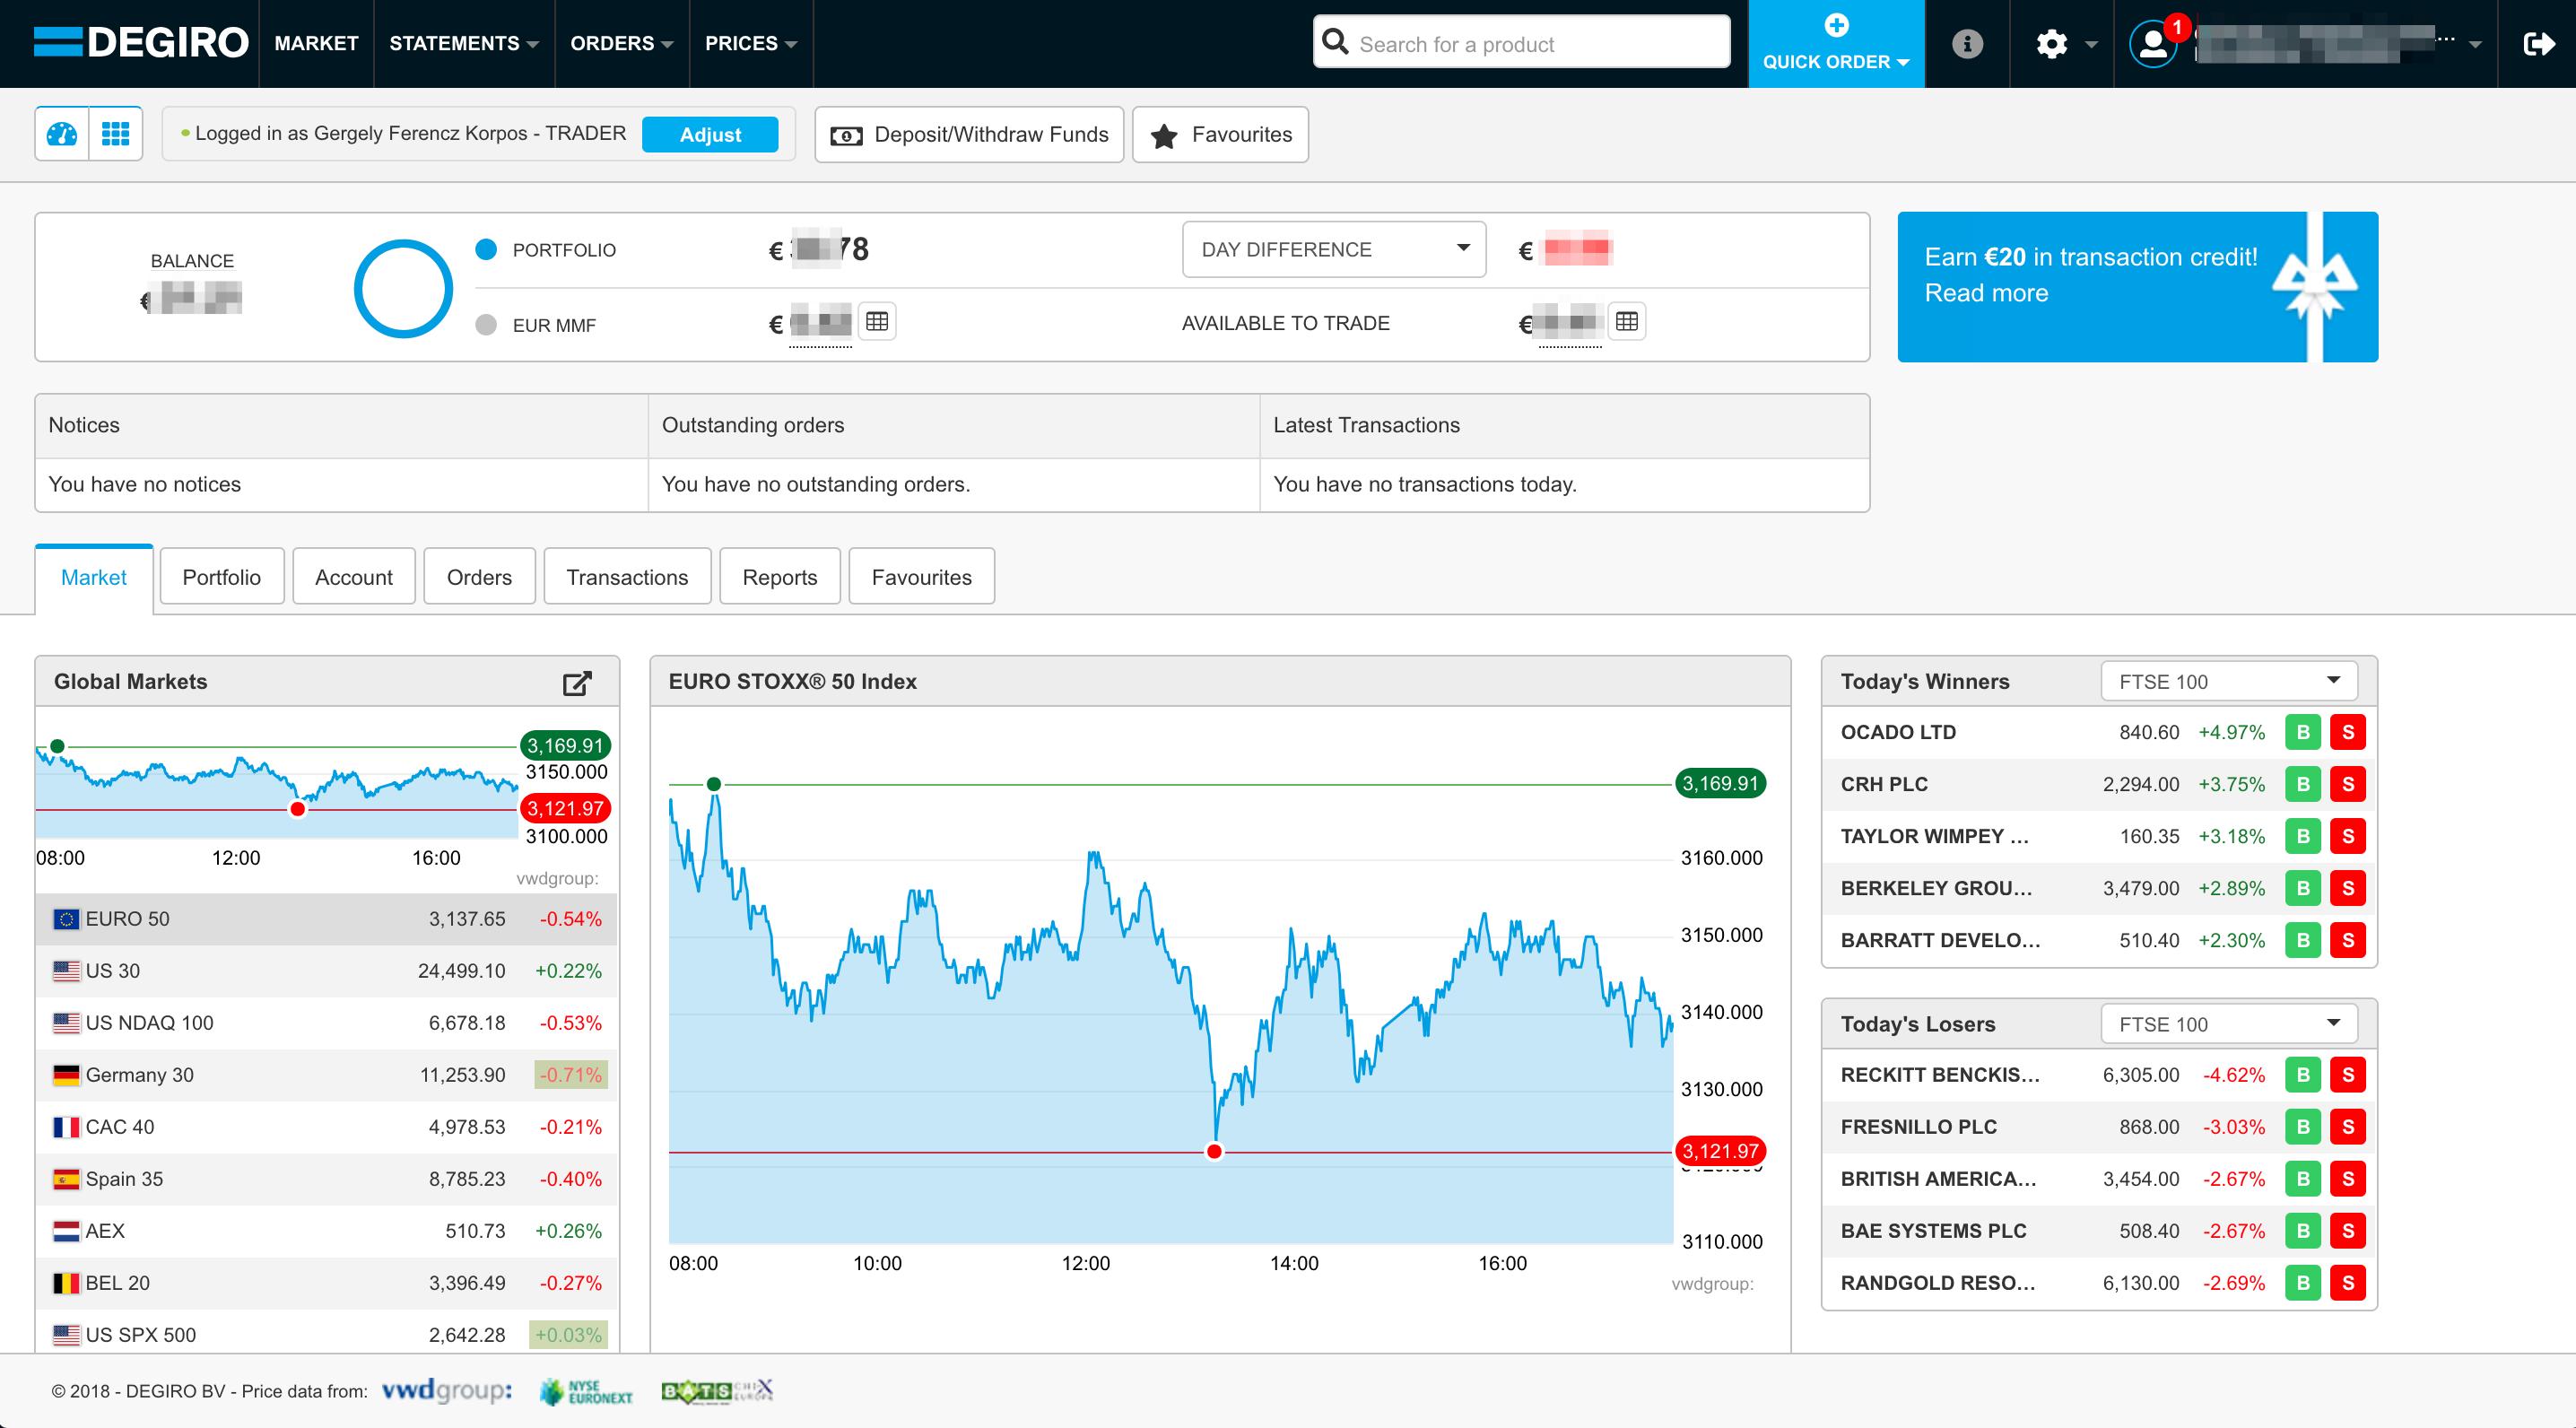 How to invest in stocks - Degiro web trading platform